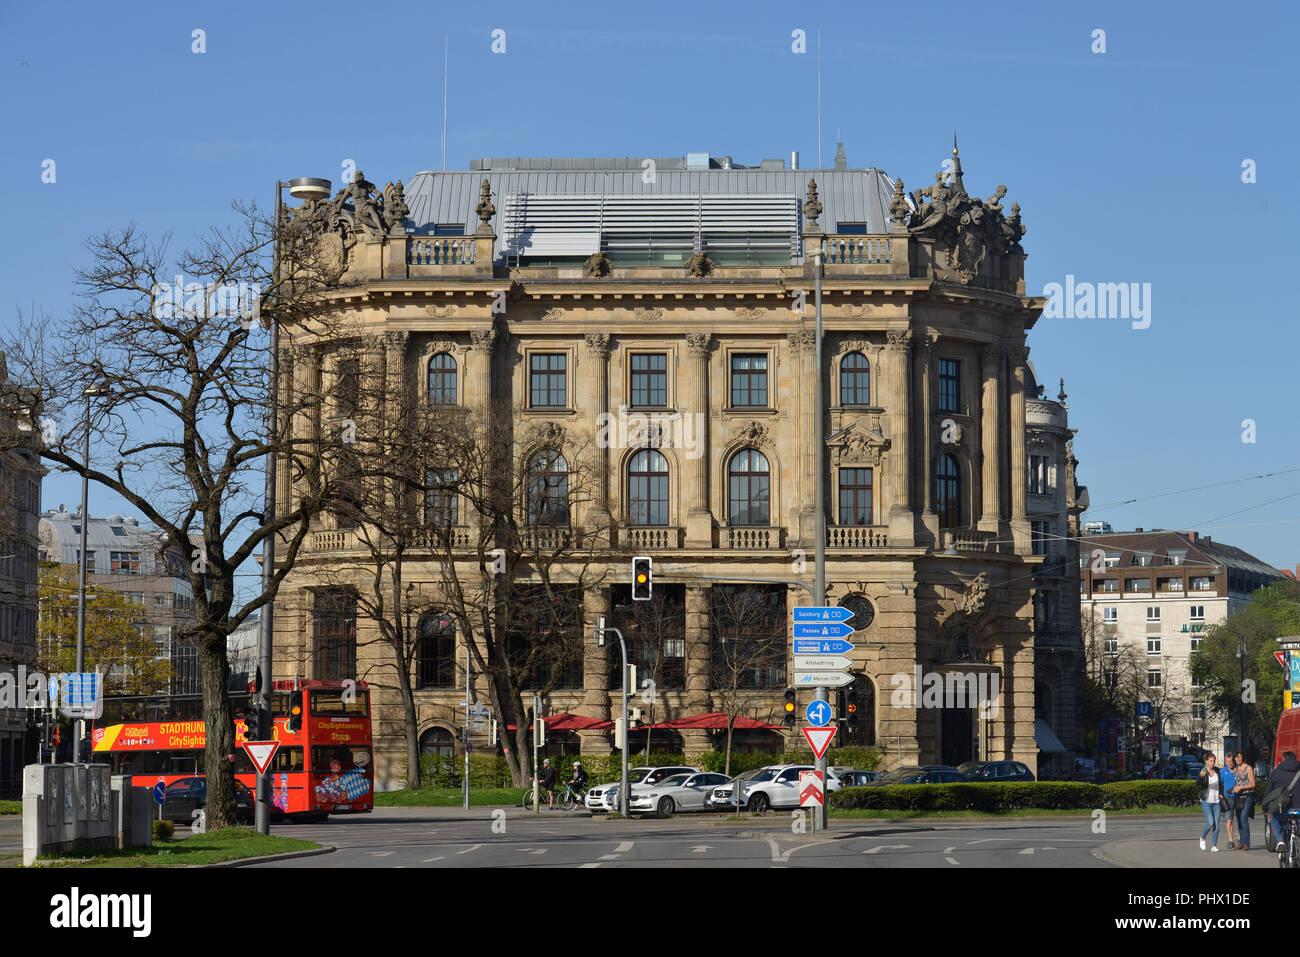 Alte Boerse, Lenbachplatz, Muenchen, Bayern, Deutschland - Stock Image